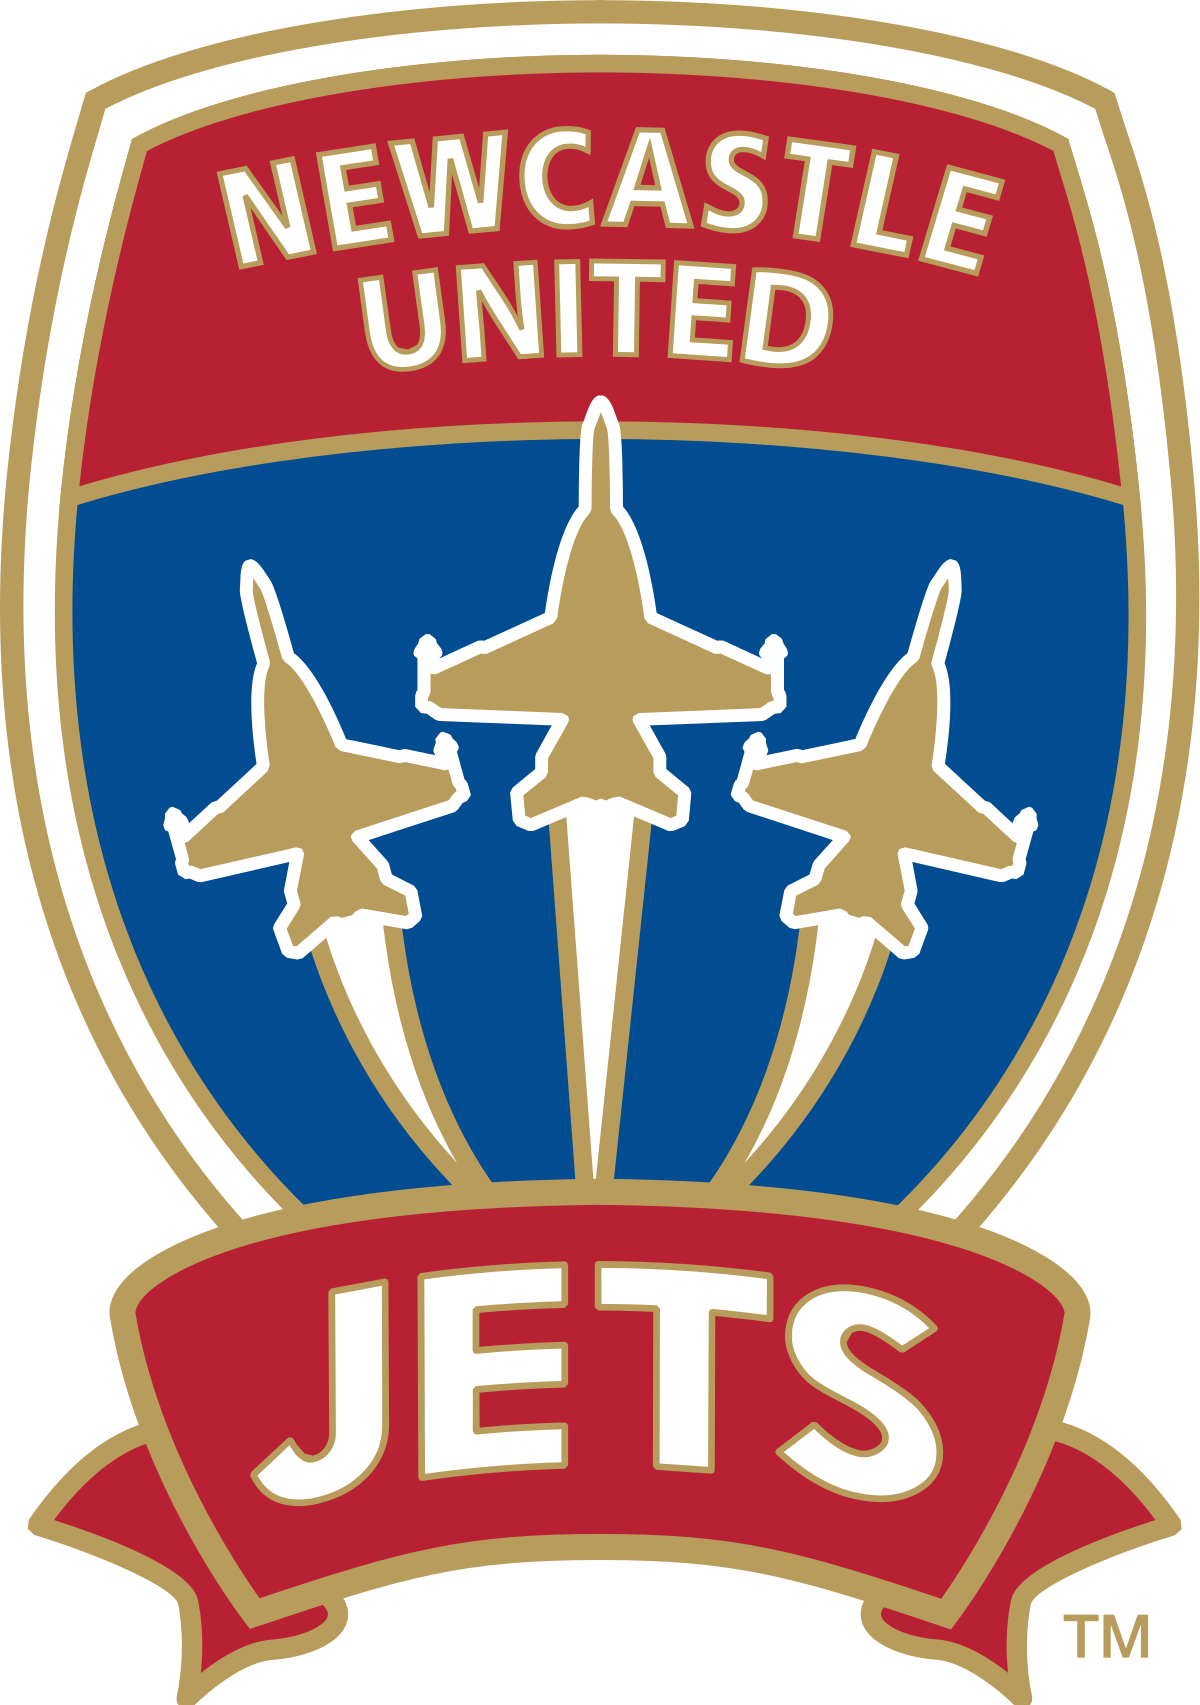 Newcastle Jets U-23 logo